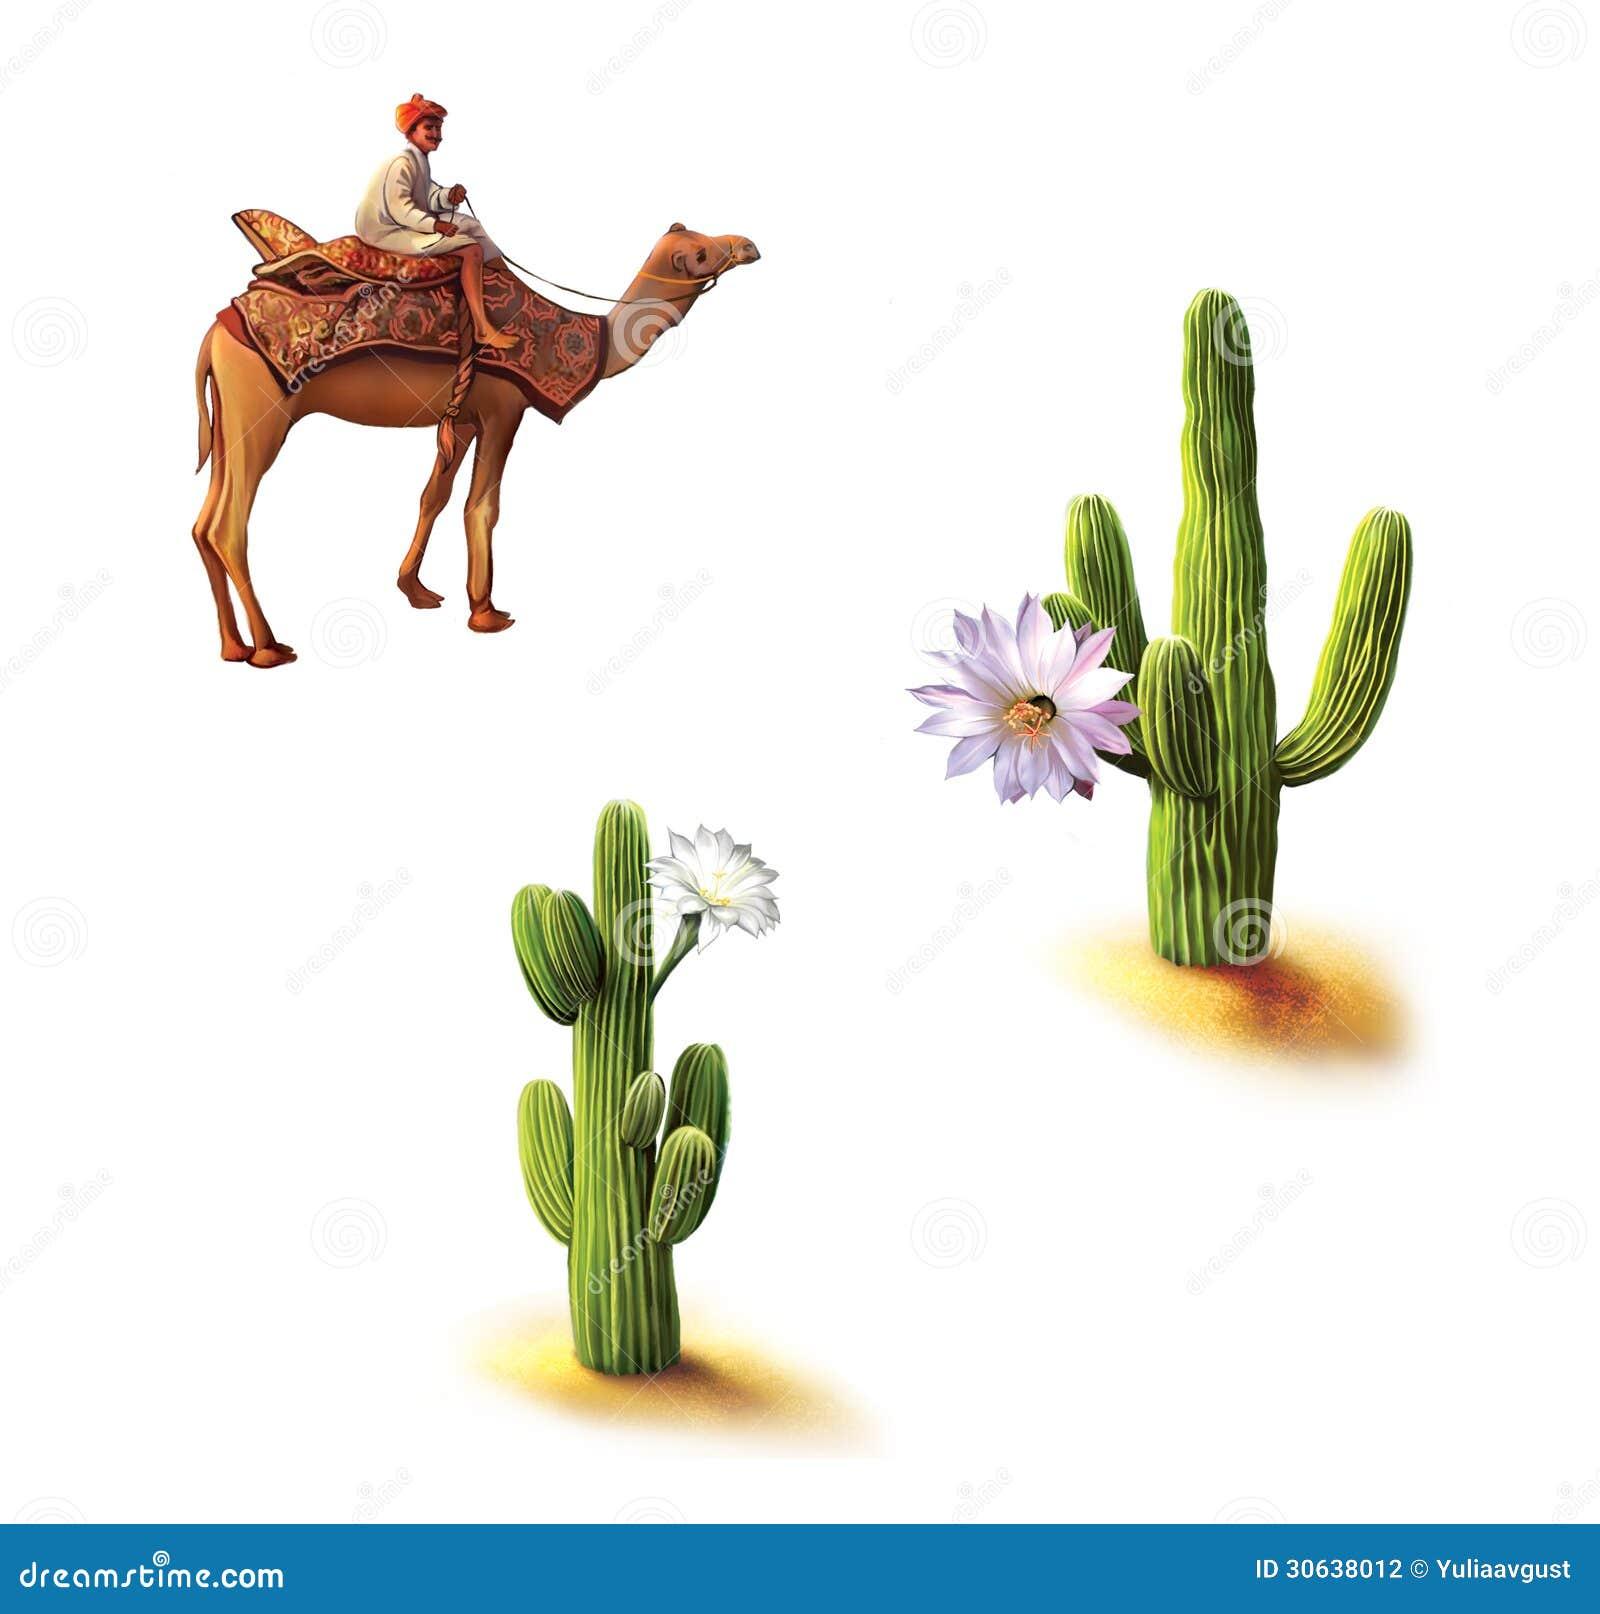 Desert, Bedouin on camel, saguaro cactus with flowers, Opuntia cactus ...Western Desert Clipart